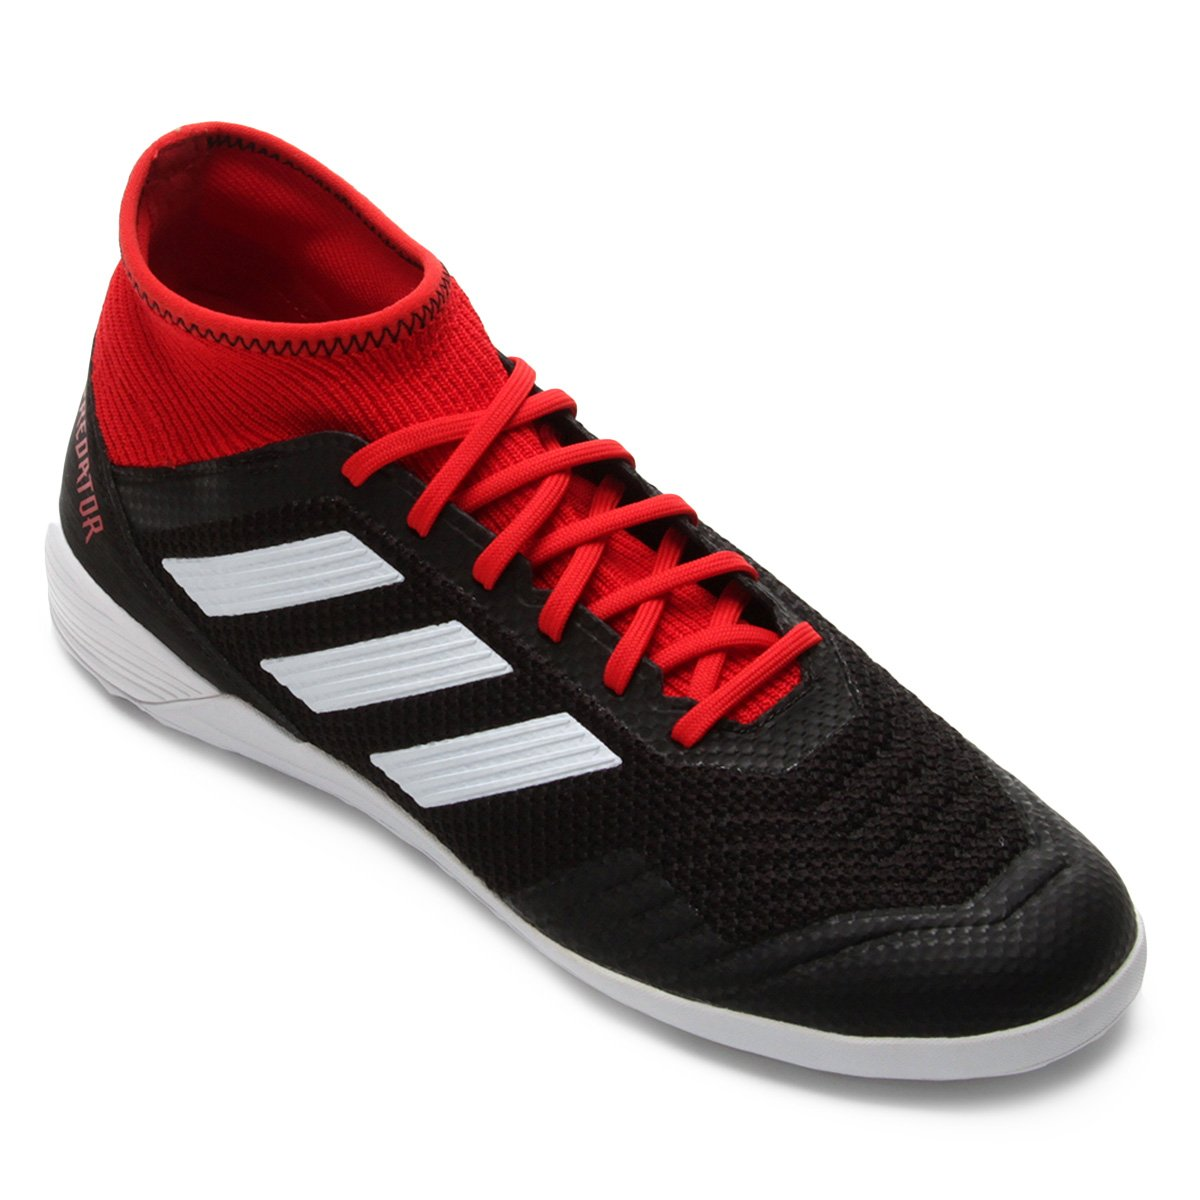 f8dd887c7 Chuteira Futsal Adidas Predator Tan 18 3 IN | Livelo -Sua Vida com ...